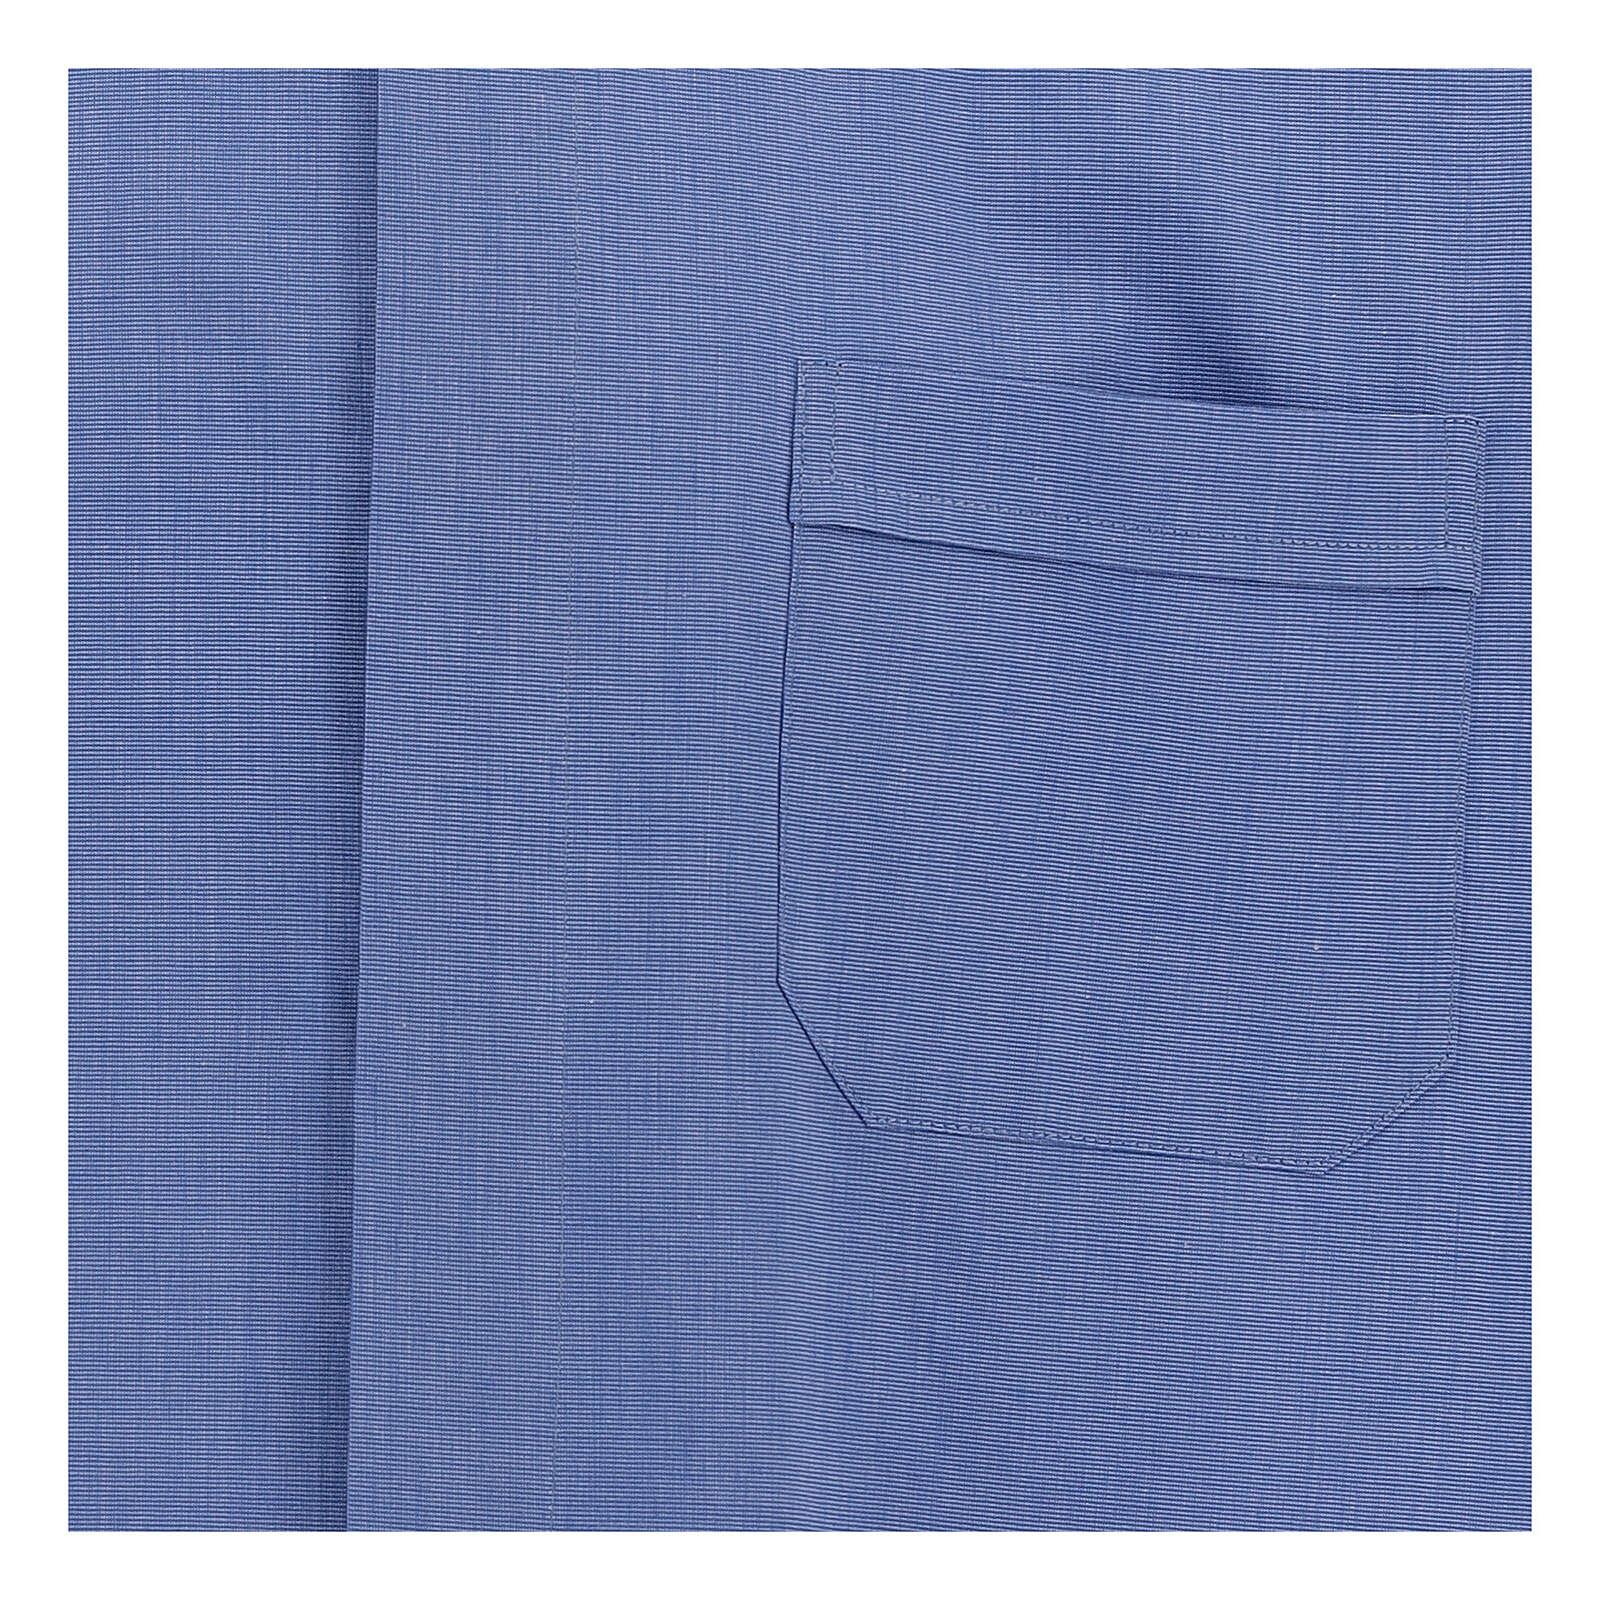 Camisa colarinho clergy filafil azul escuro manga curta 4